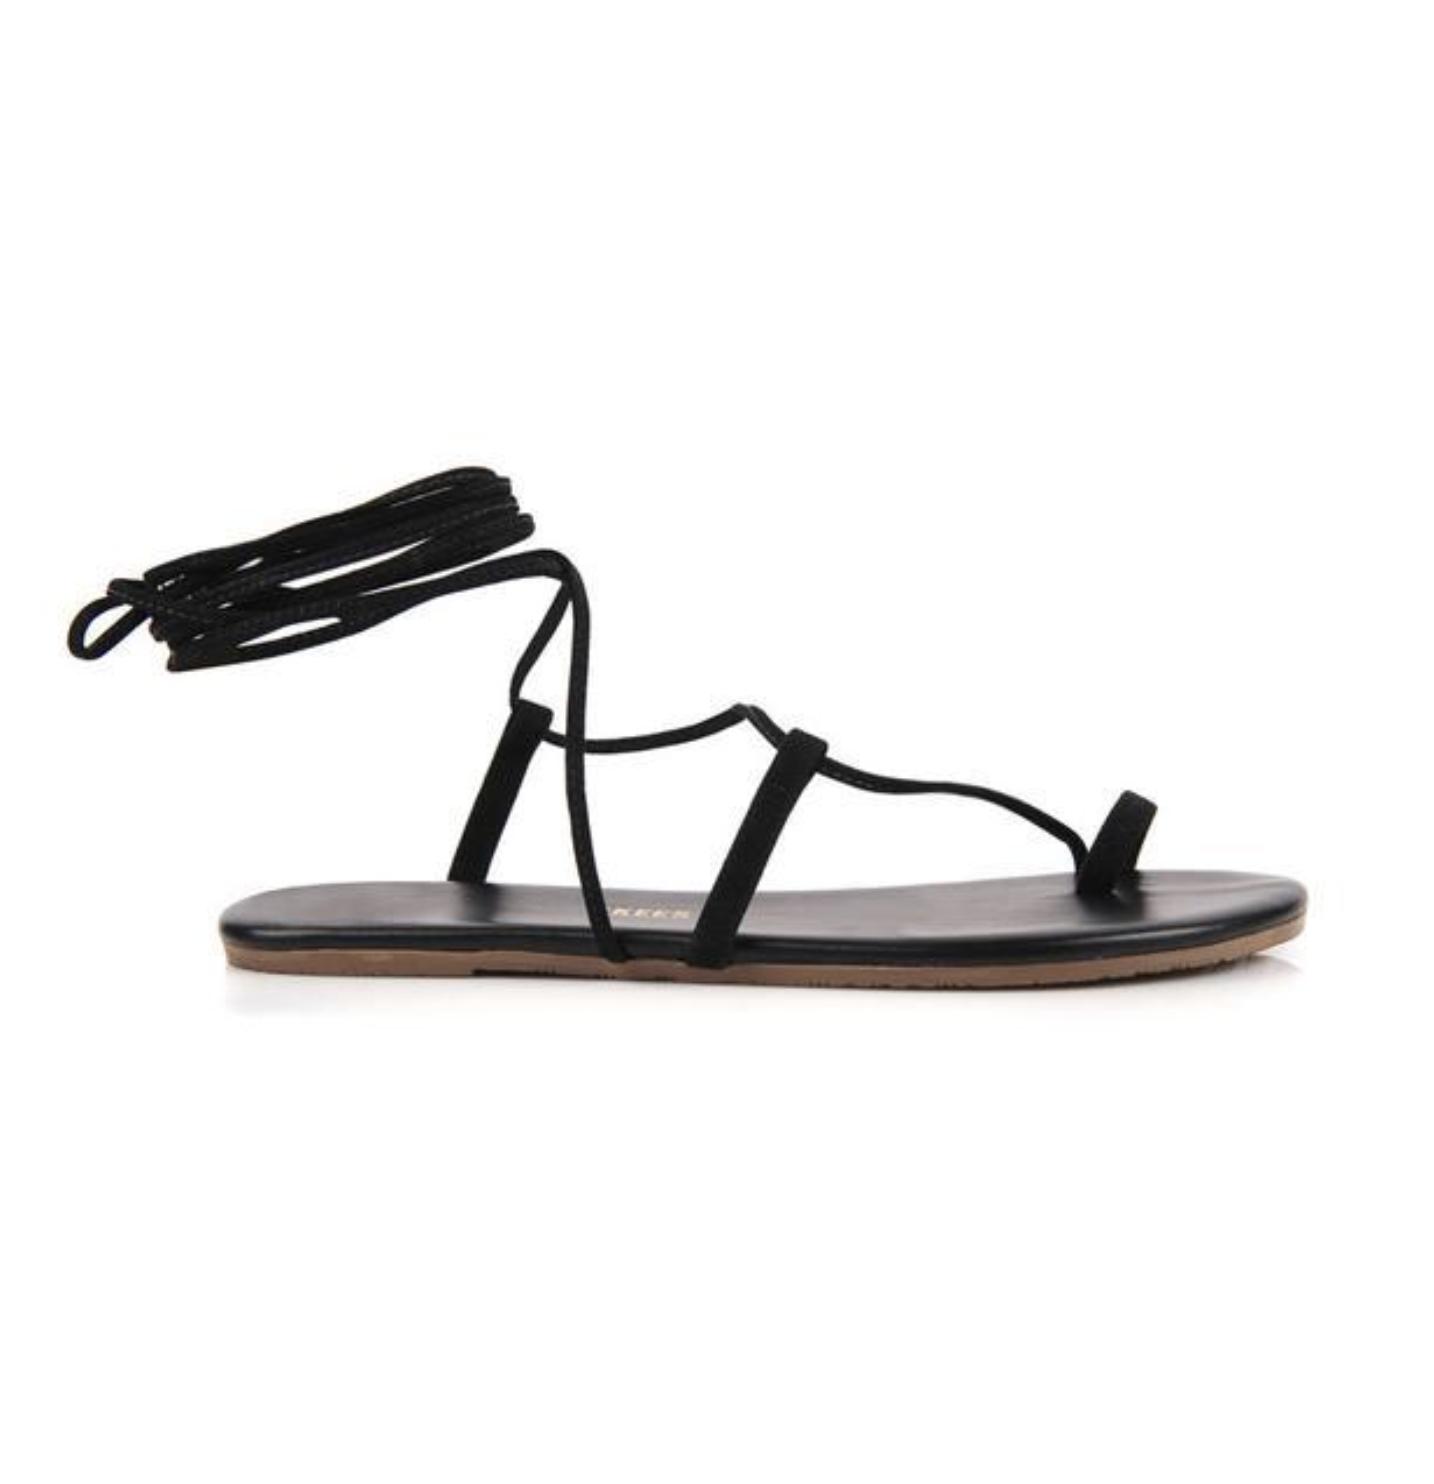 Tkees Jo sandals